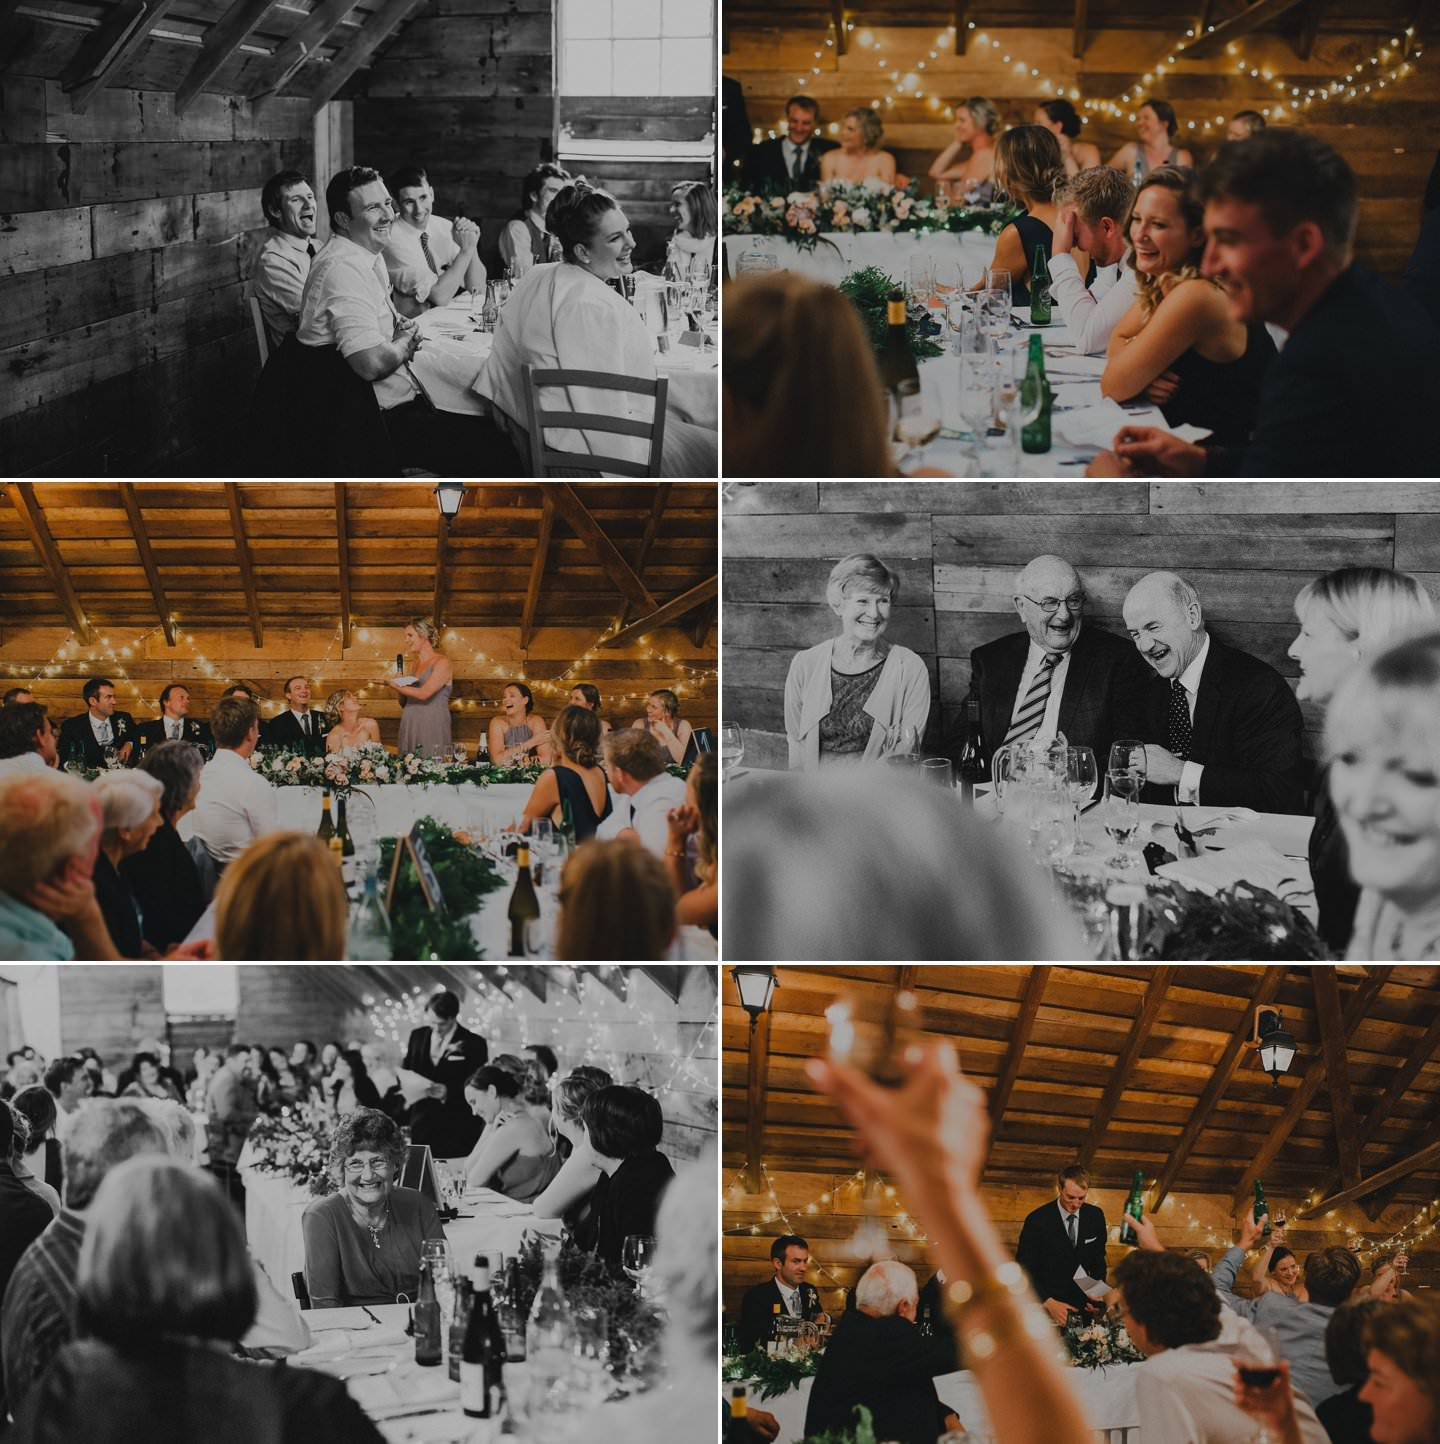 Candid Wedding photography.  Toast at a wedding reception